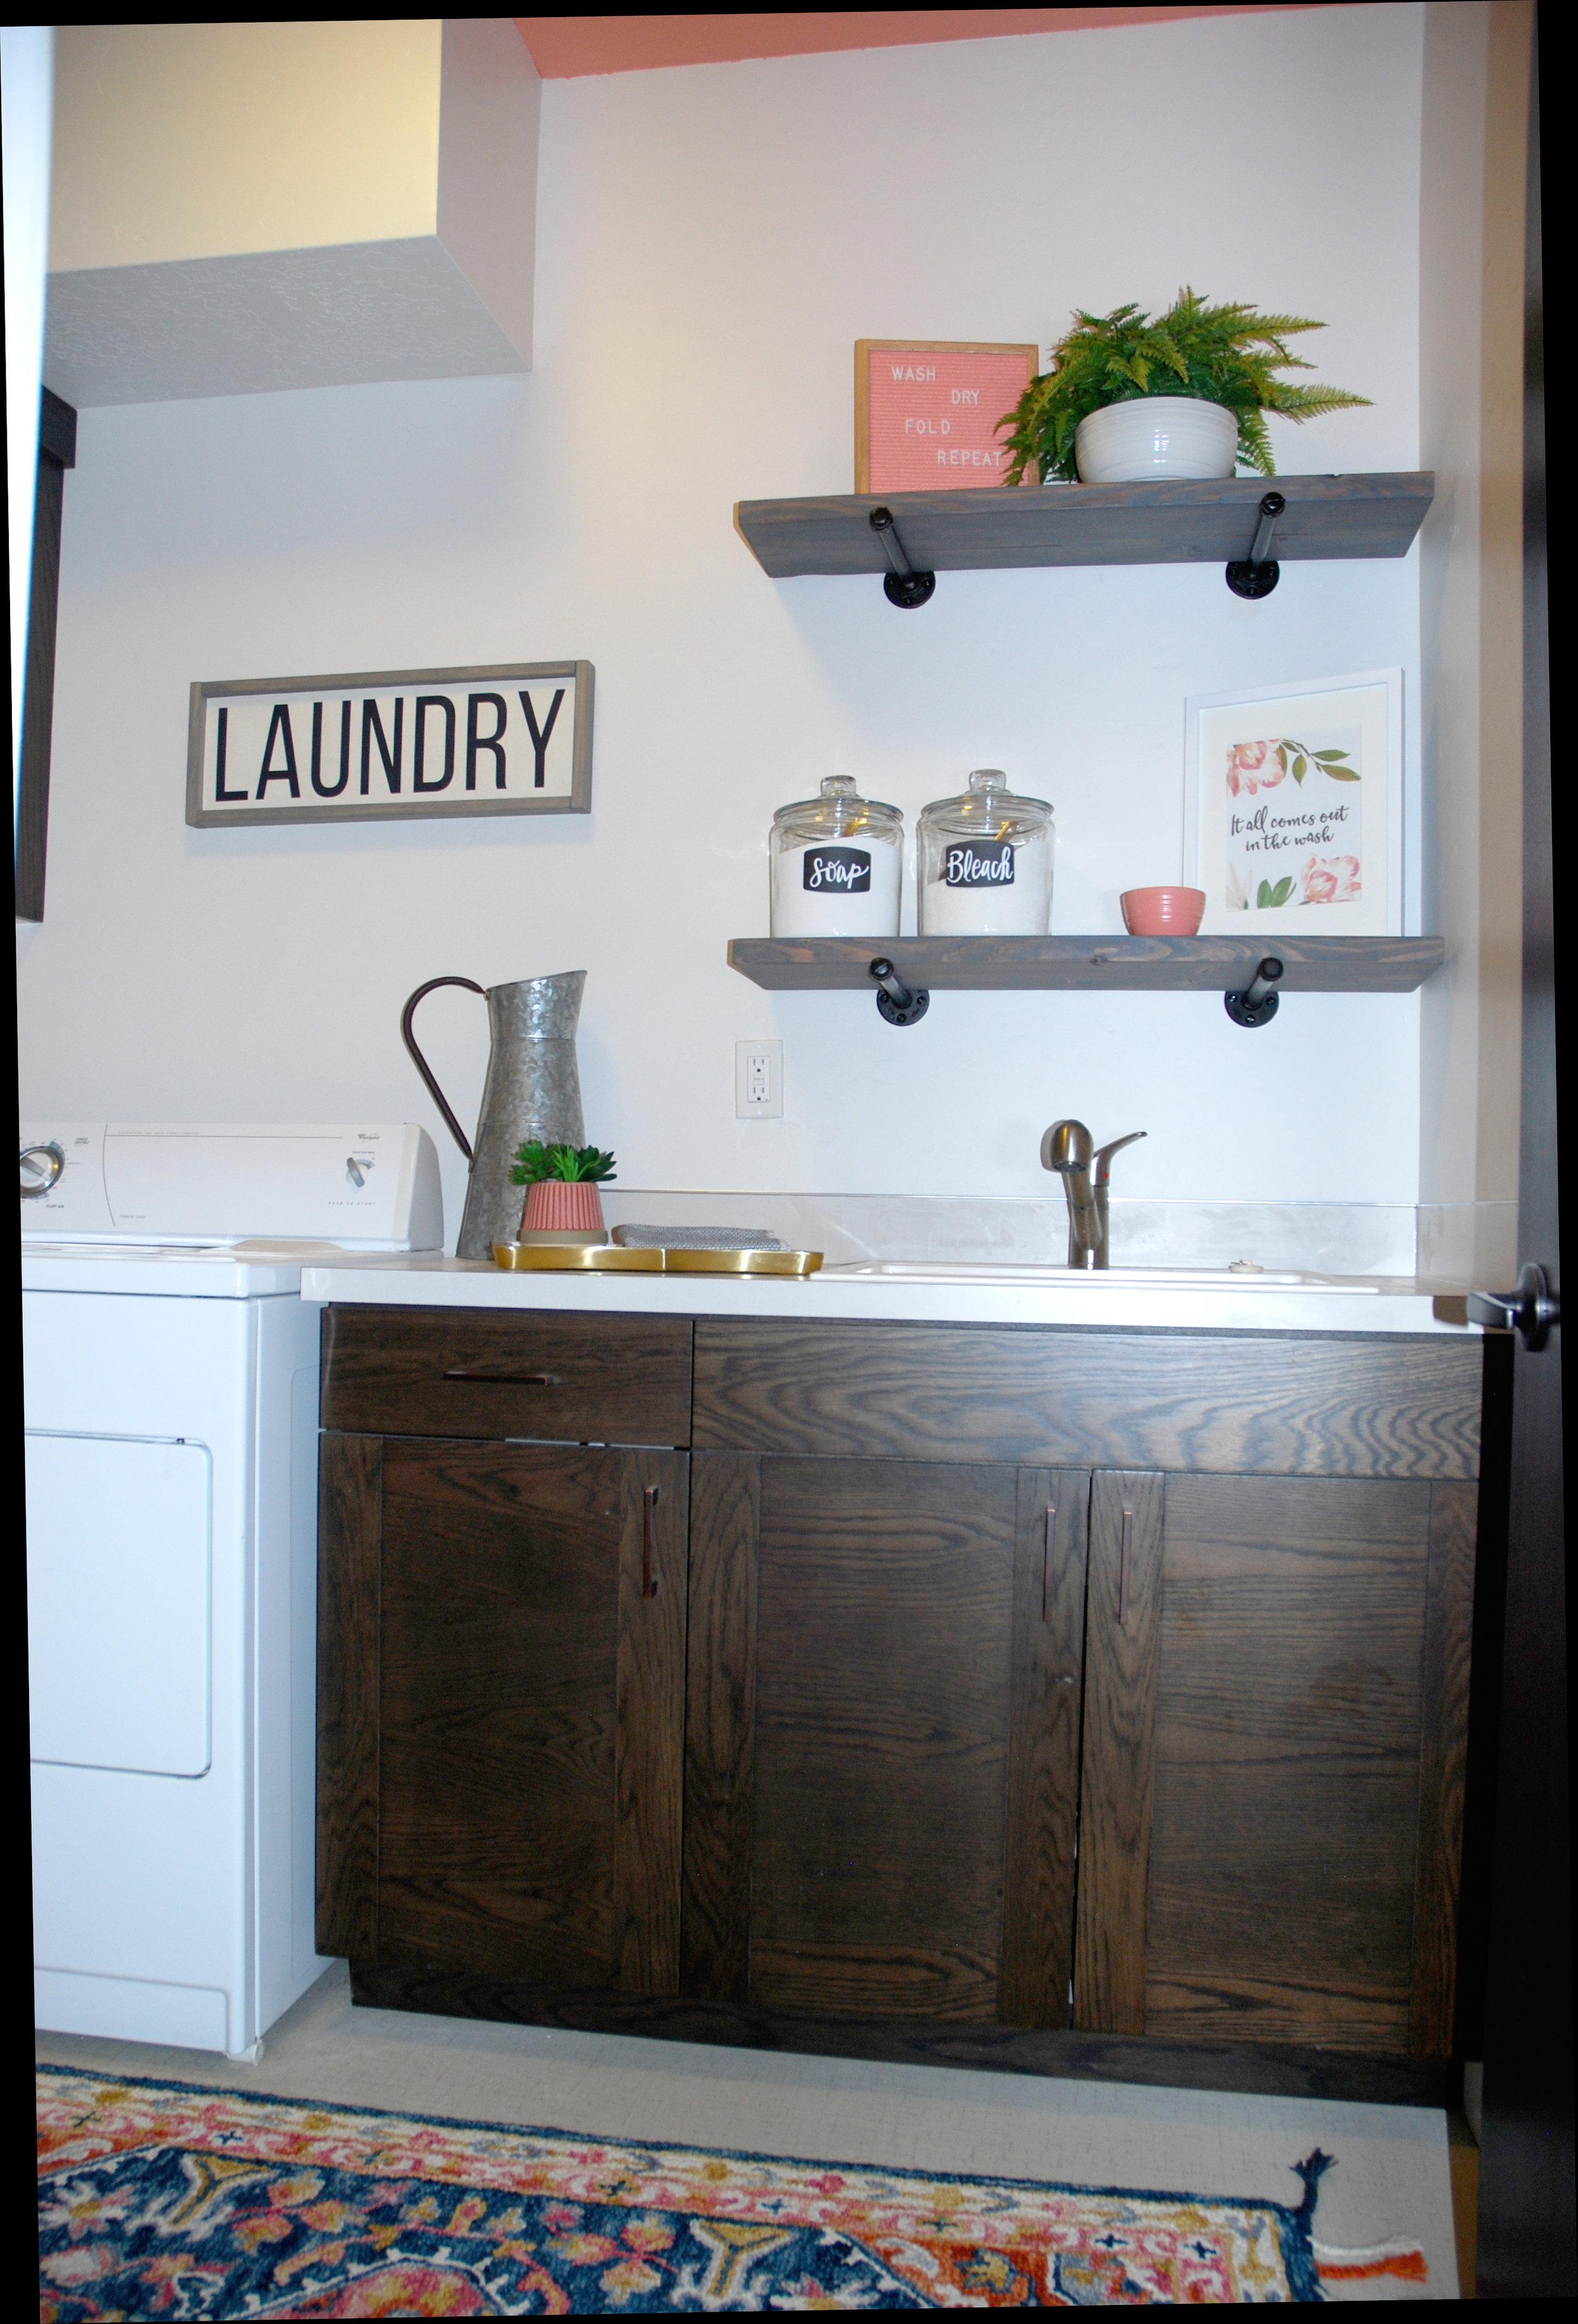 laundry rug.JPG